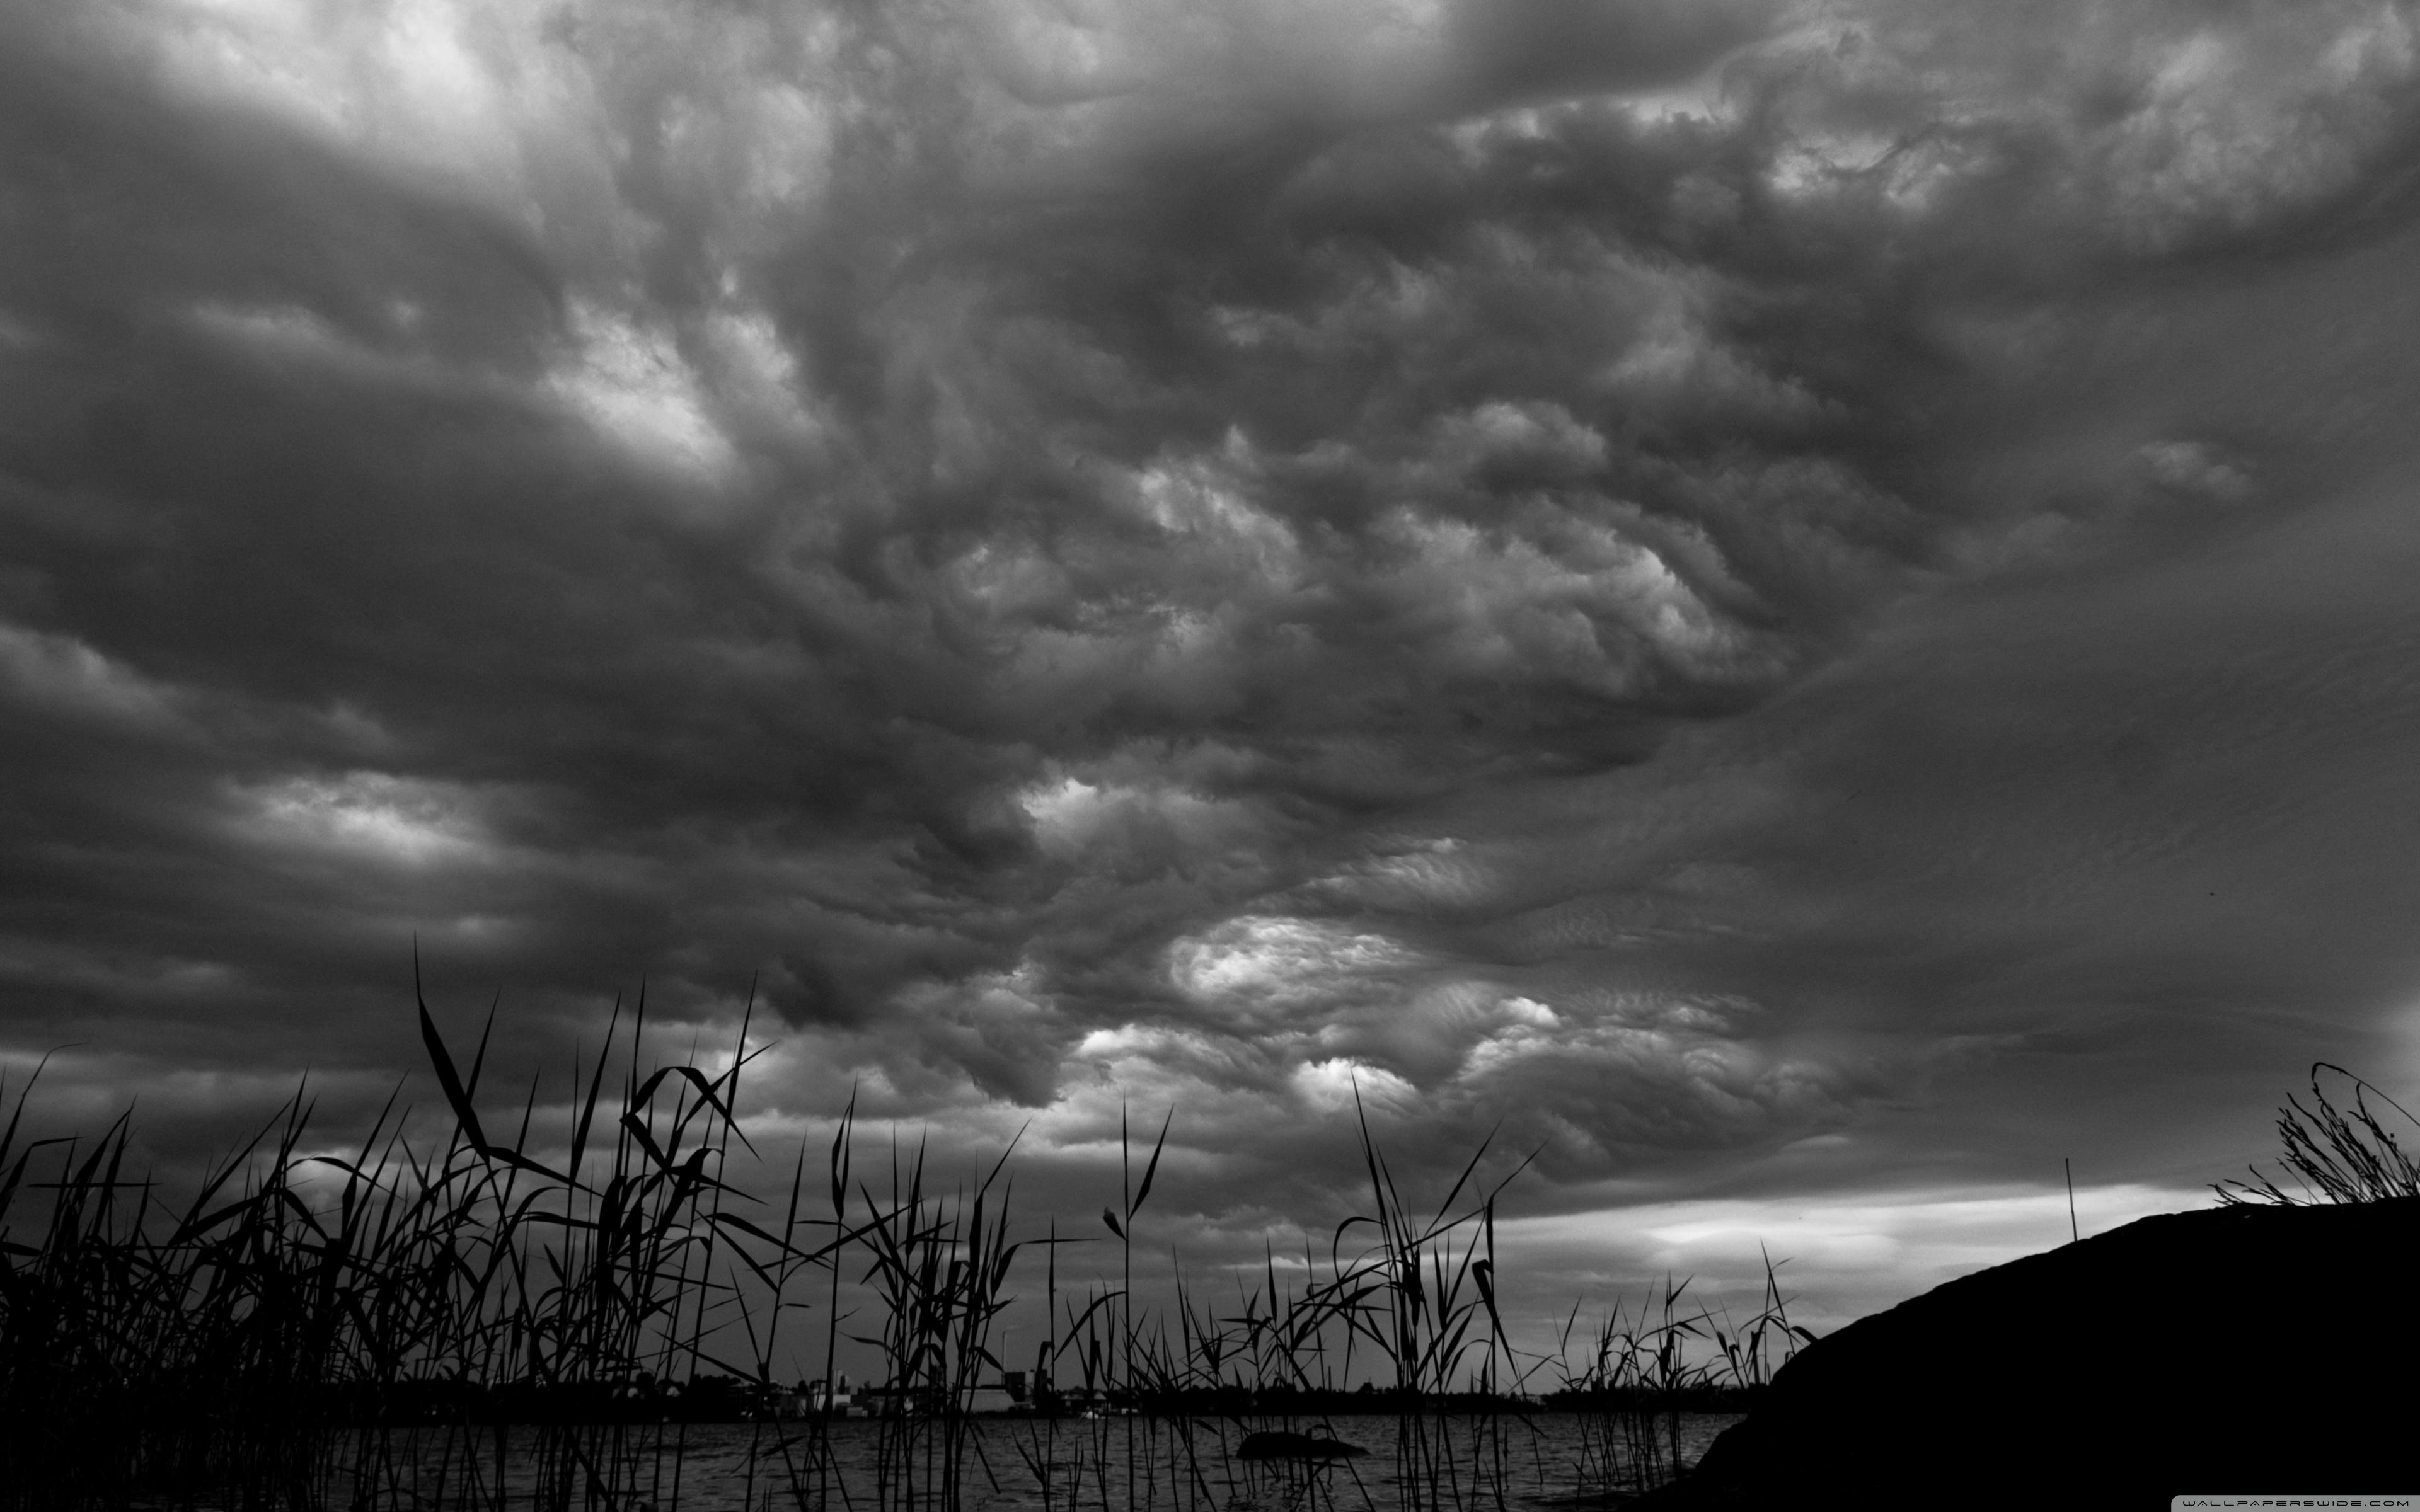 Download Free WallpaperDark Stormy Clouds